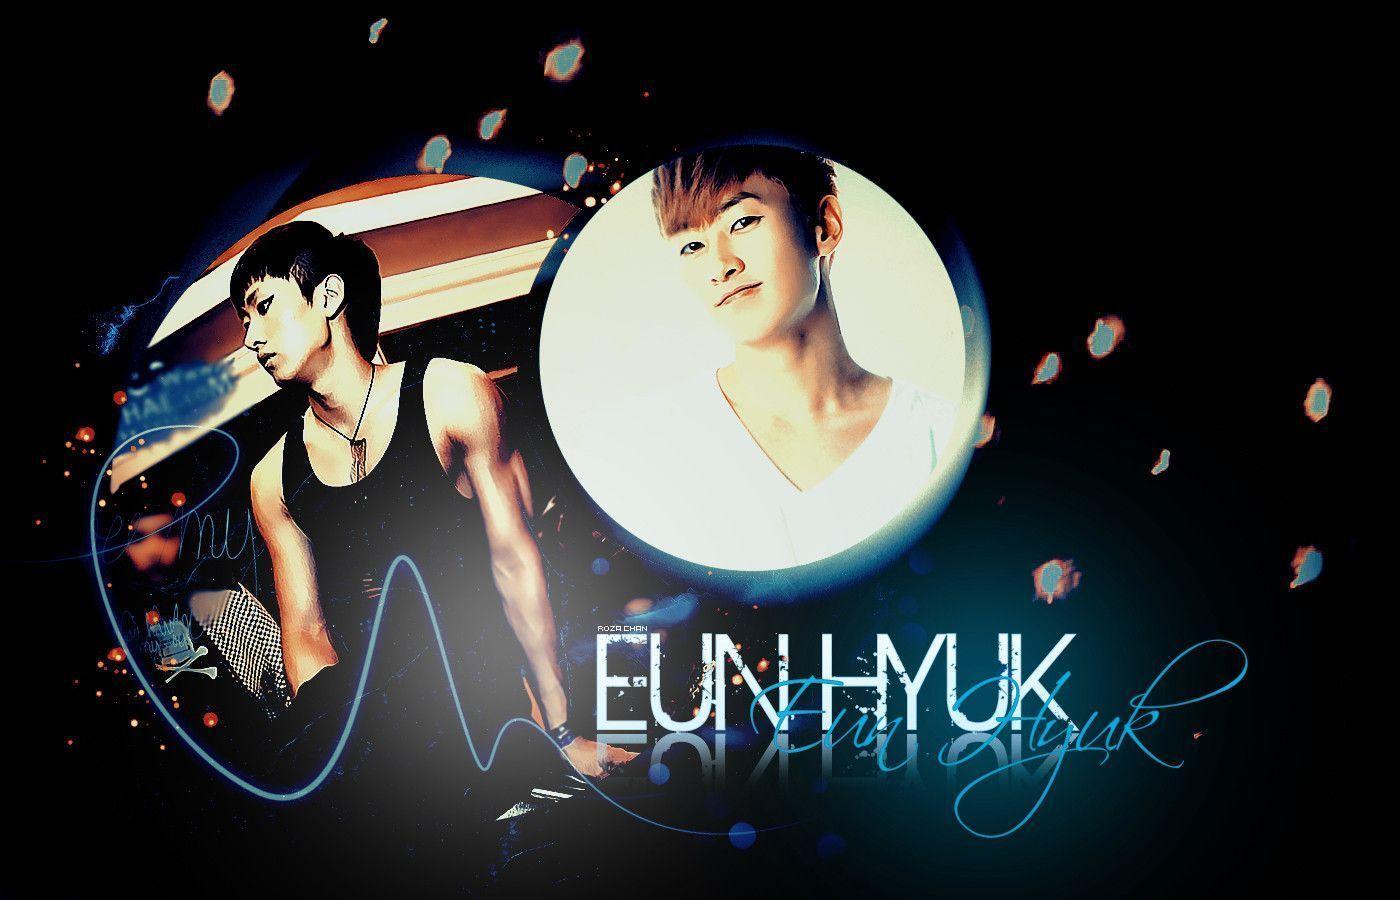 Eunhyuk Wallpaper by RozaChan on DeviantArt